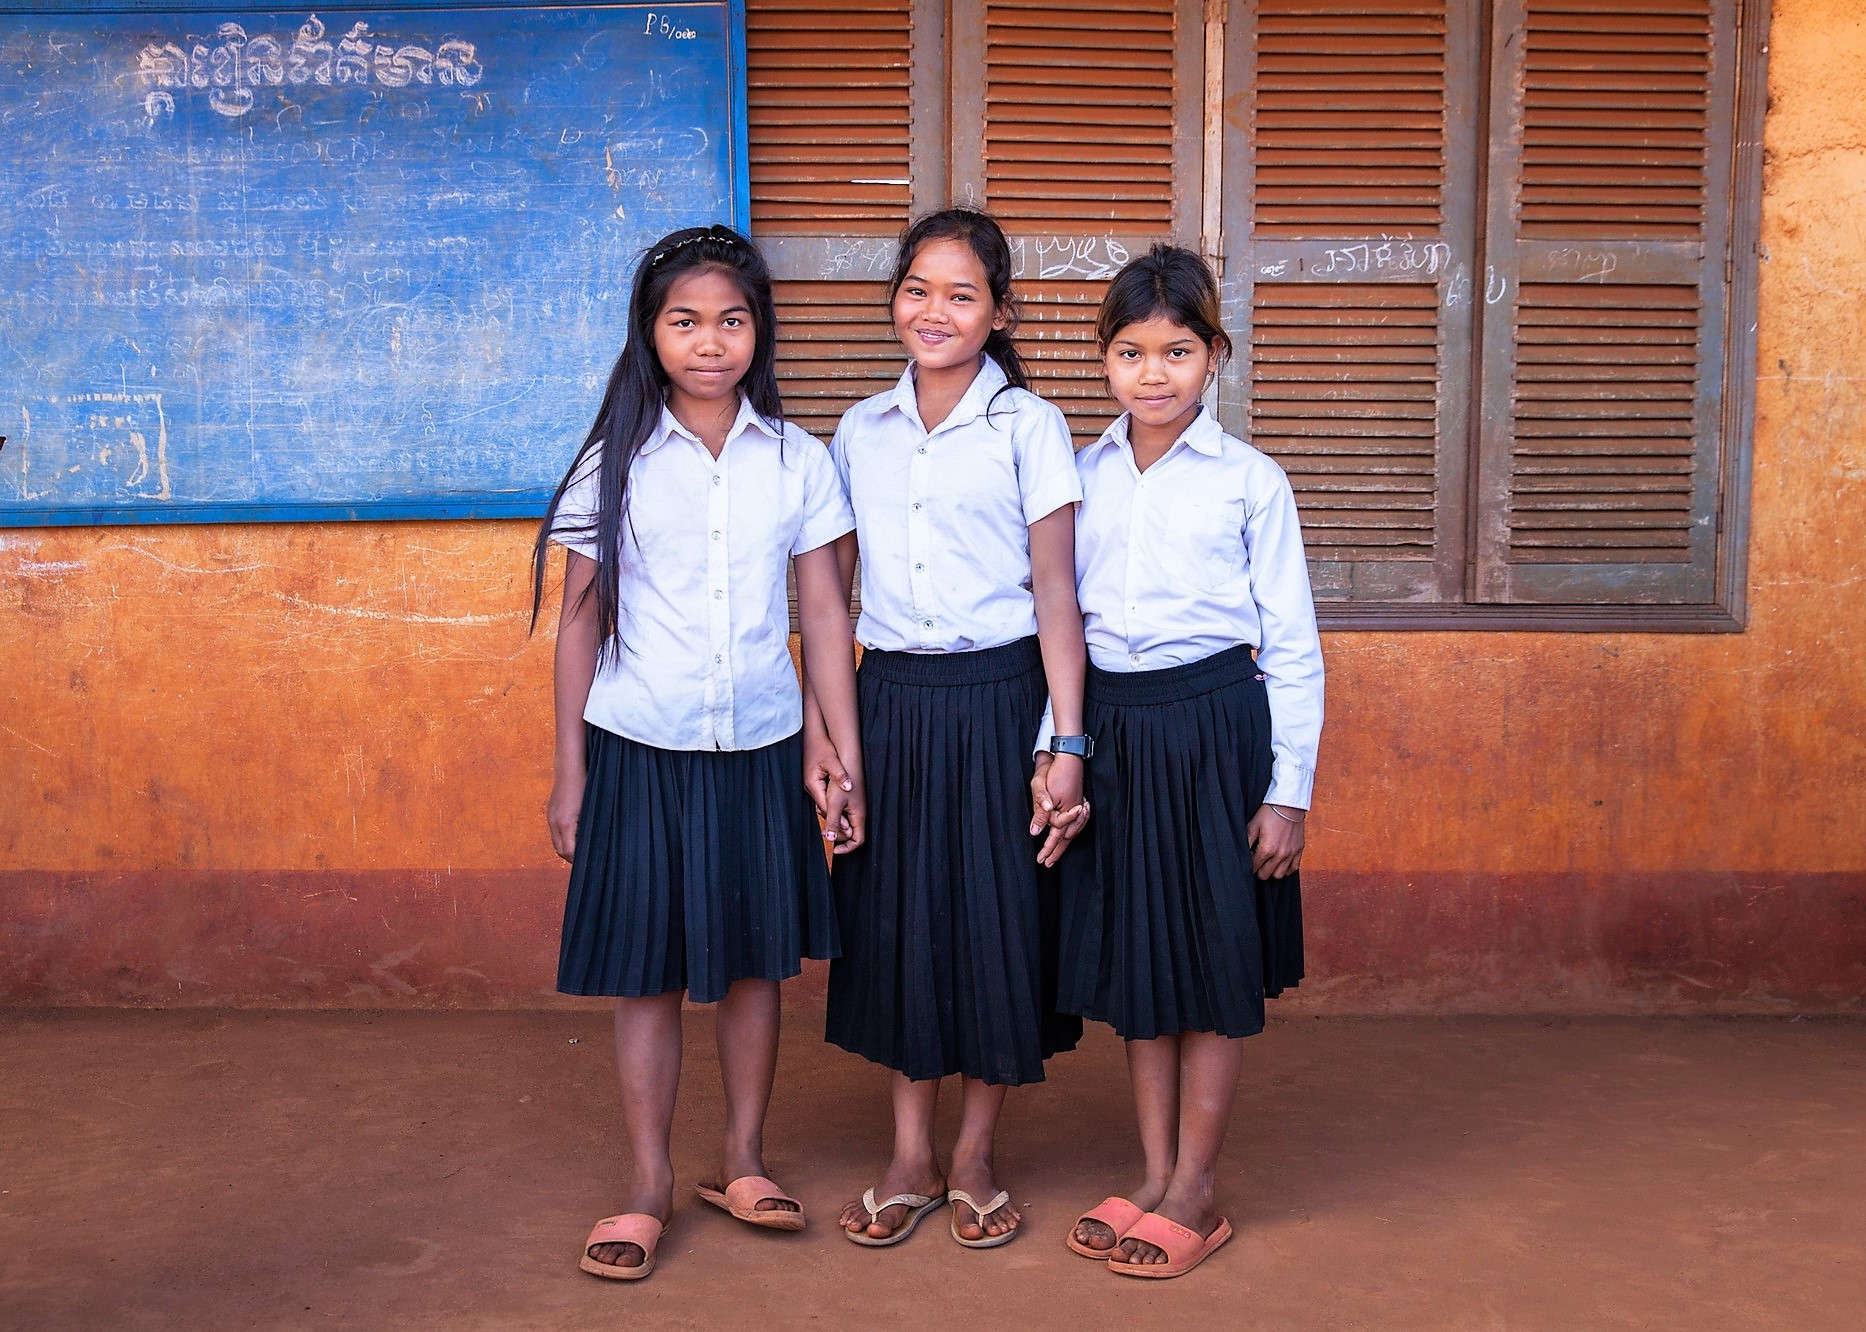 RS7587_CARE_Indigenous_Schools141112-8015-lpr.jpg